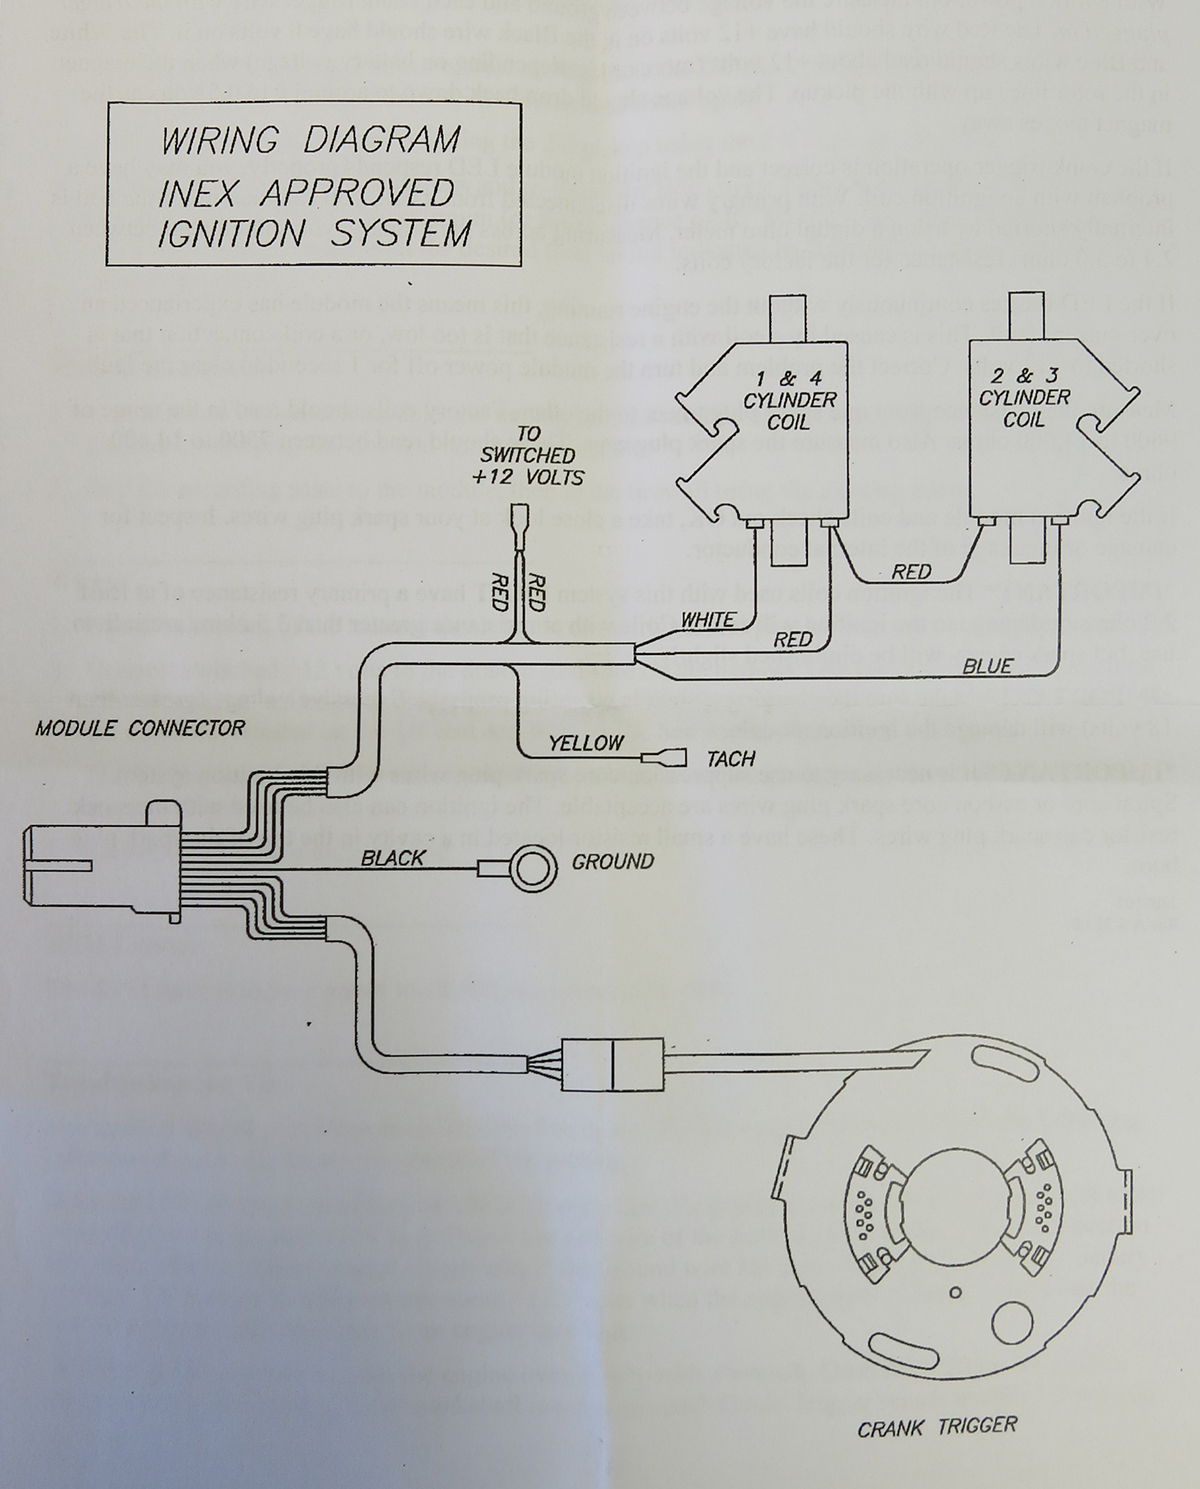 inexboxwiringdiagram?t\=1439404195 red box wiring diagram wiring diagram schematic name